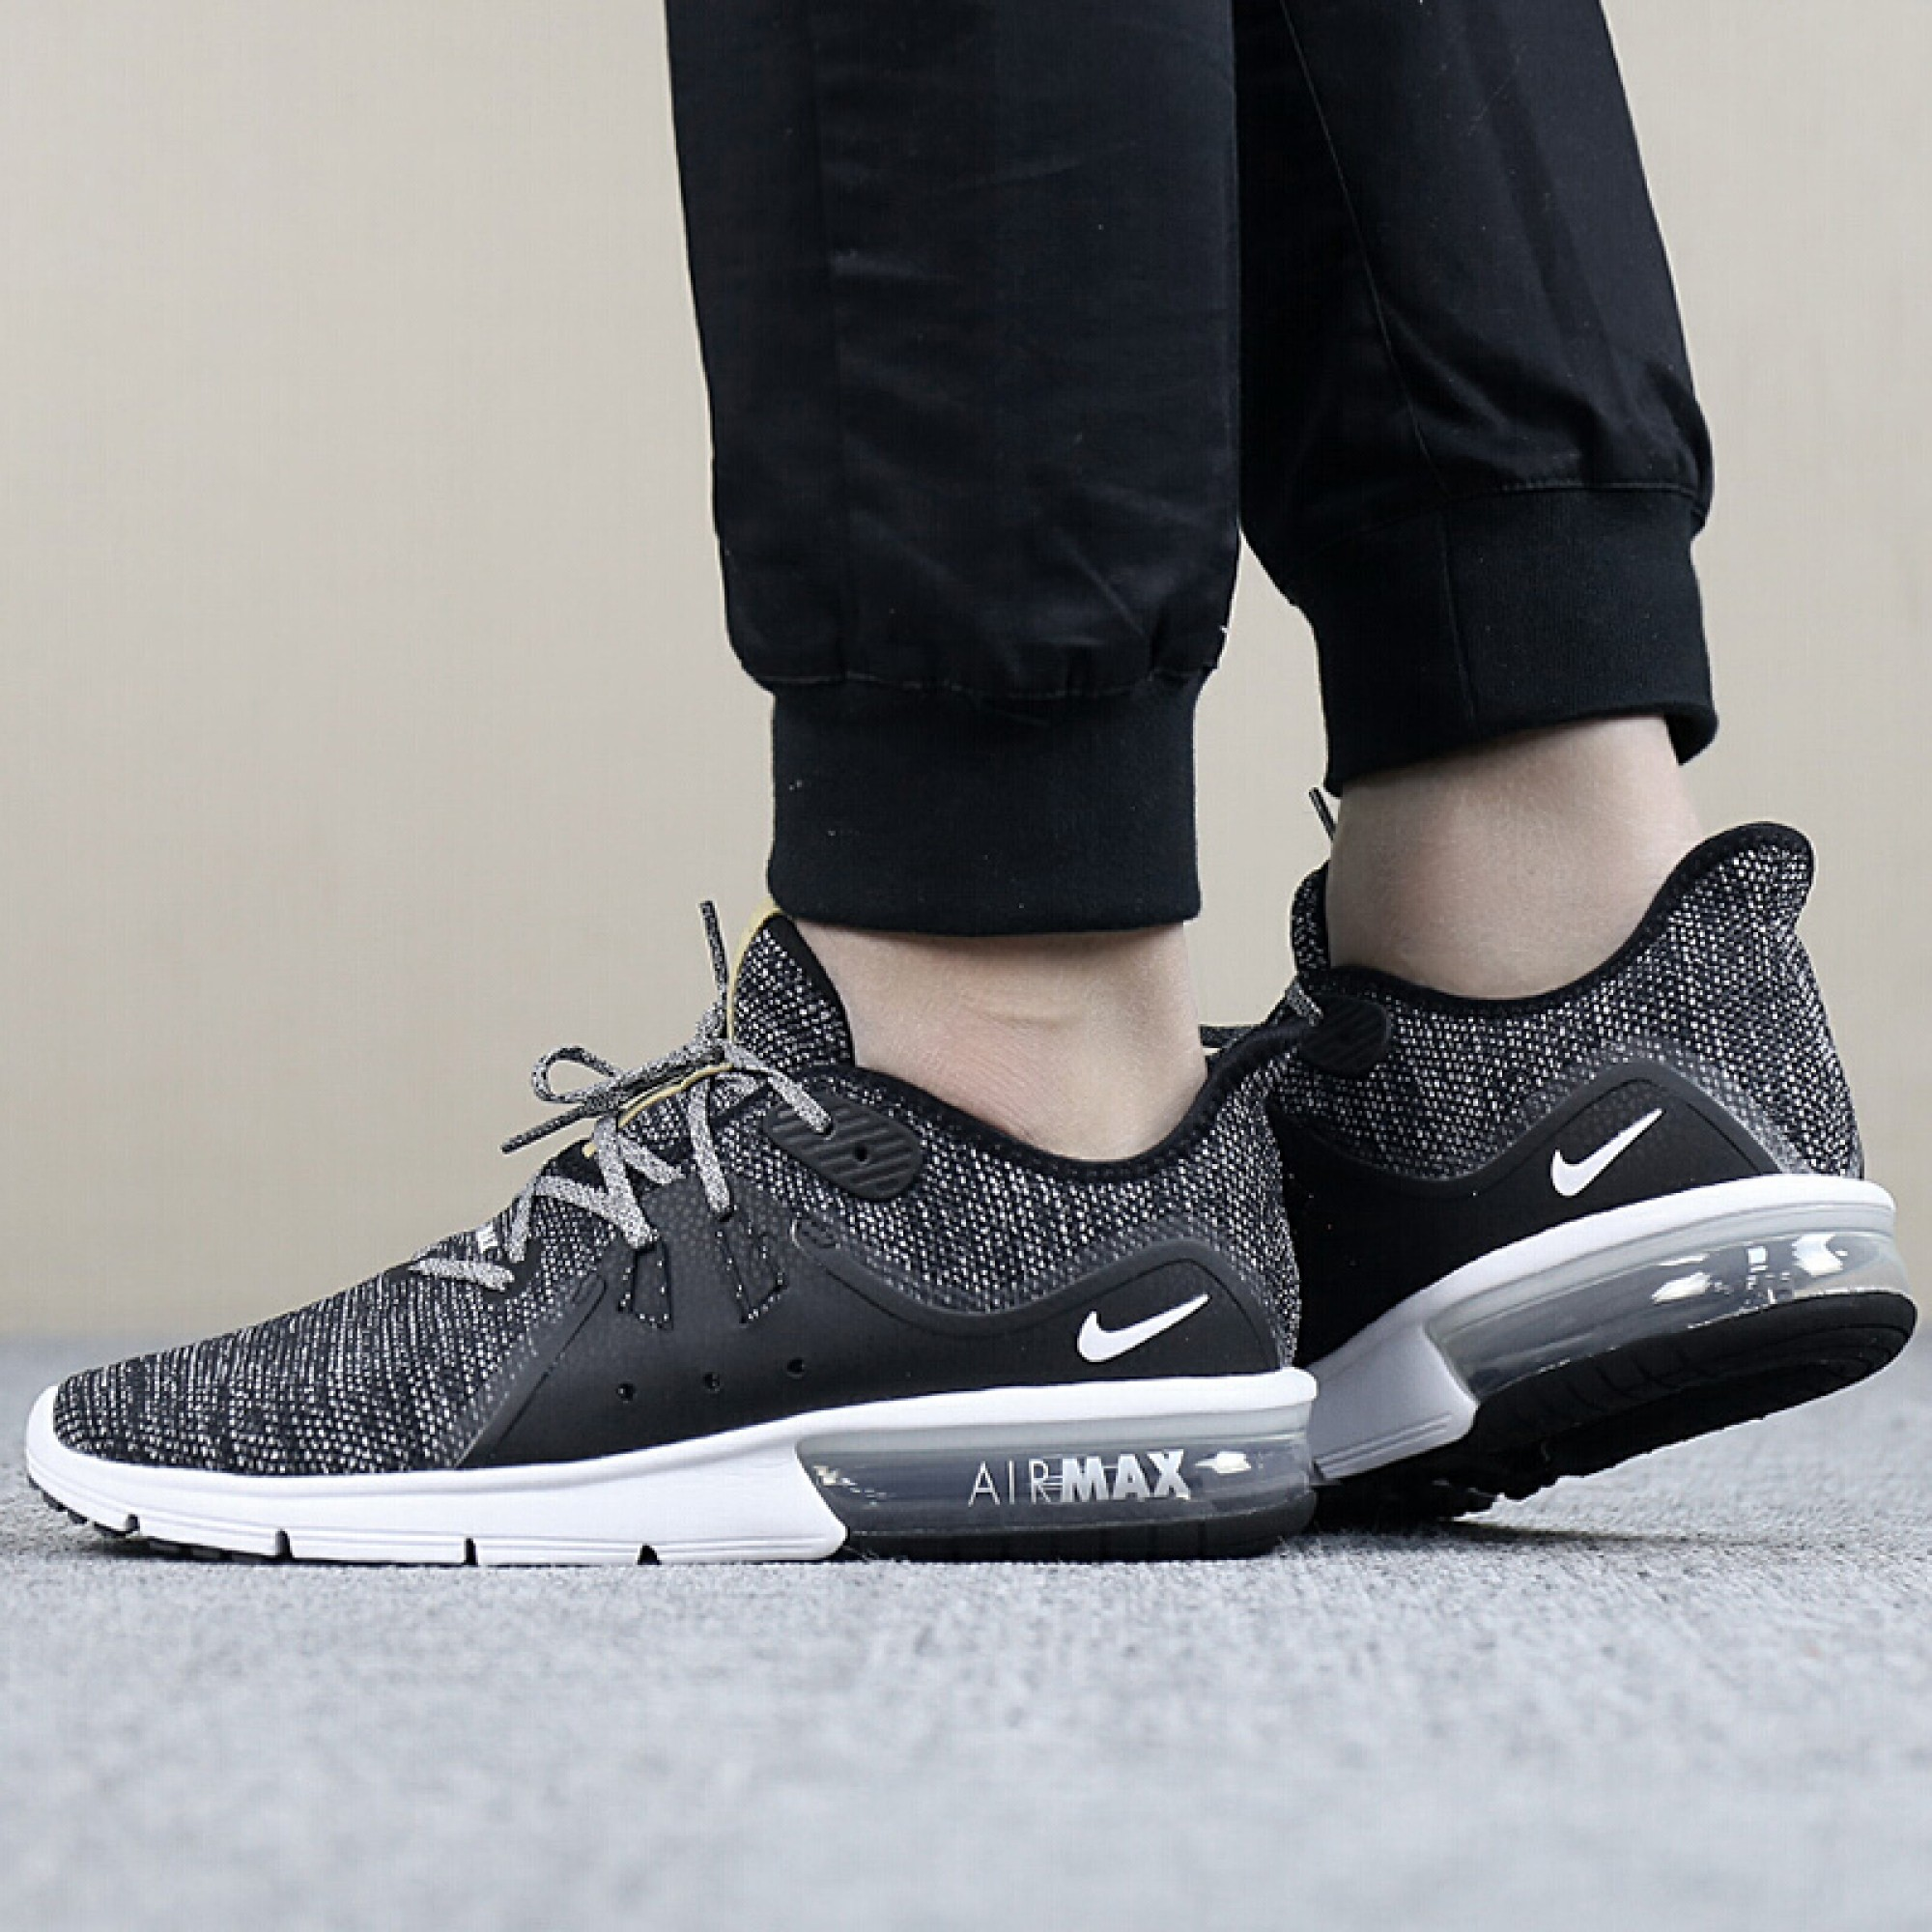 3f0c5f156ca ... Men's Nike Air Max Sequent 3 921694-011 Black- White Ανδρικό  Μαύρο-Λευκό ...